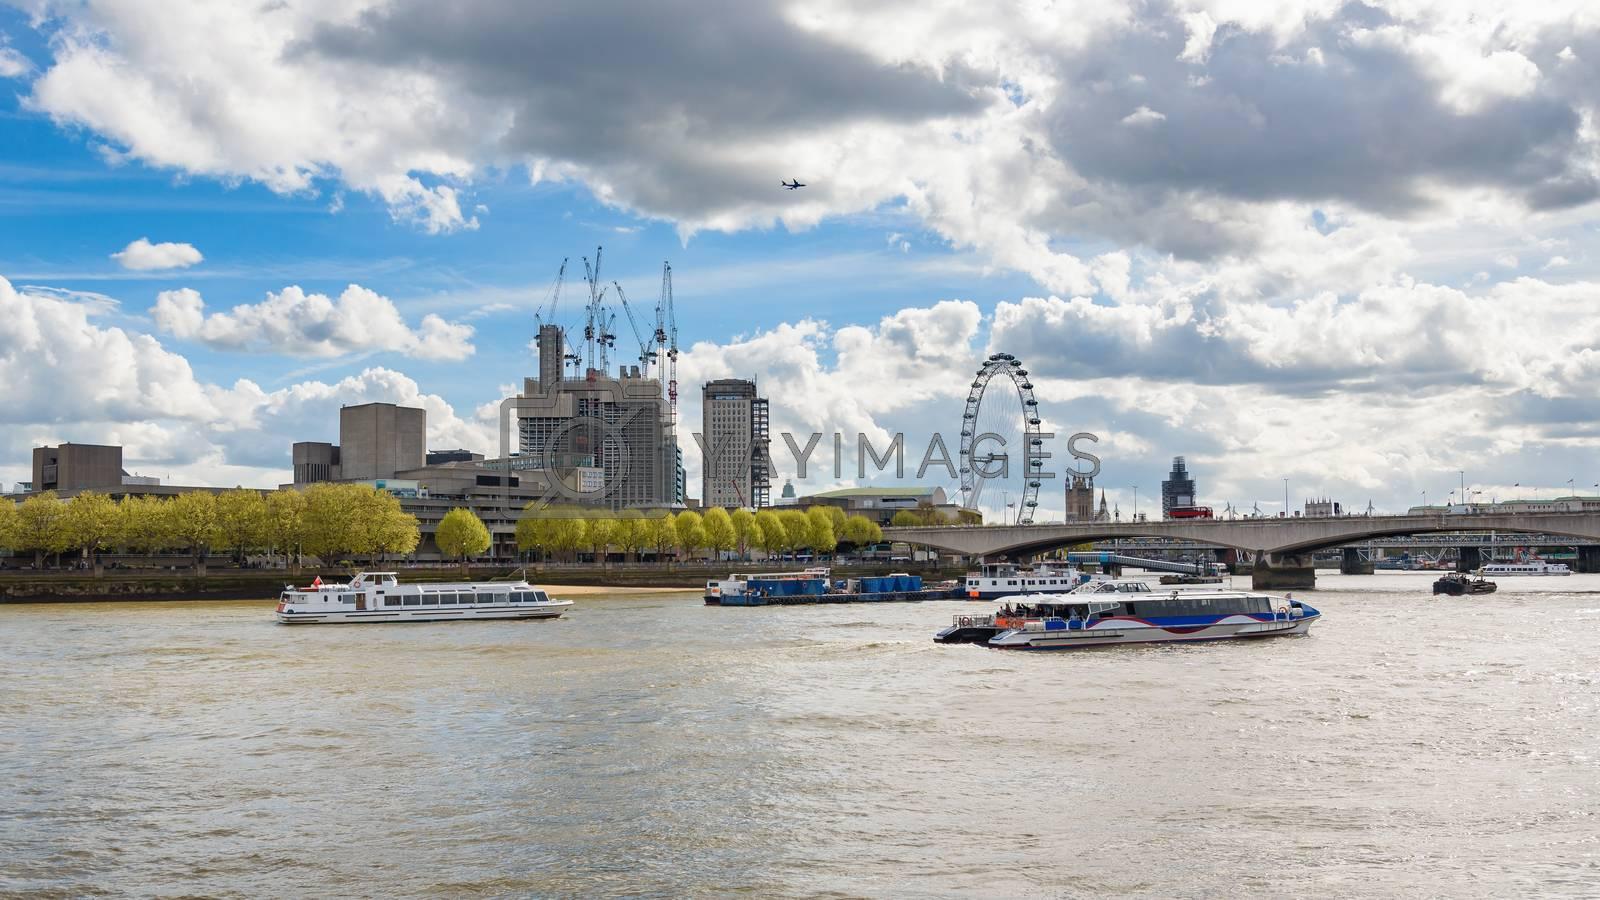 Ships on River Thames in London, United Kingdom